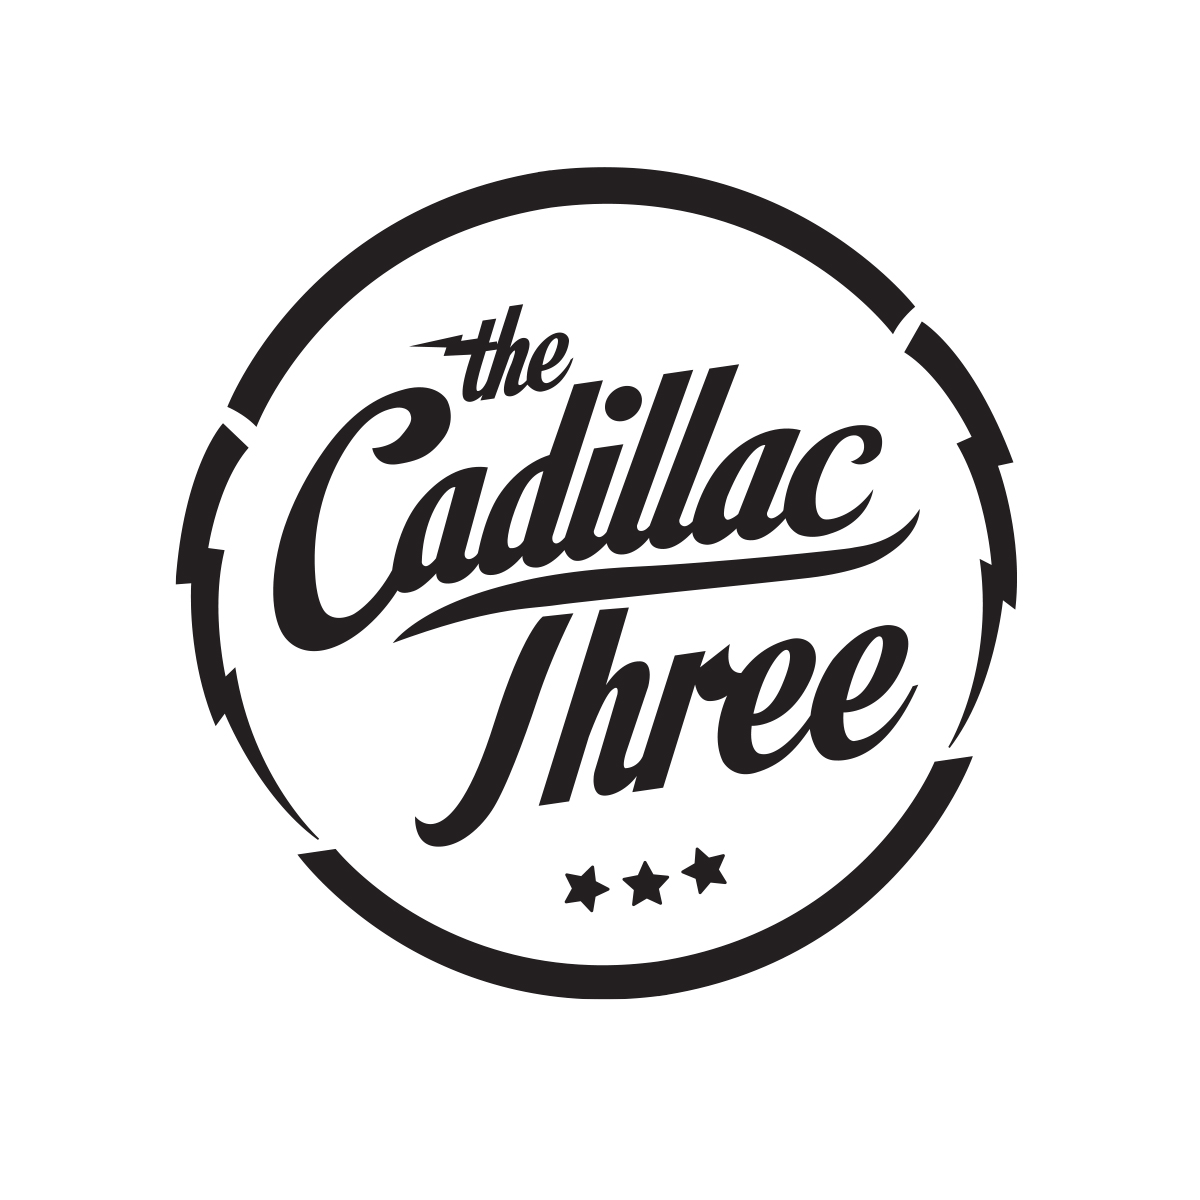 The Cadillac Three Gift Card